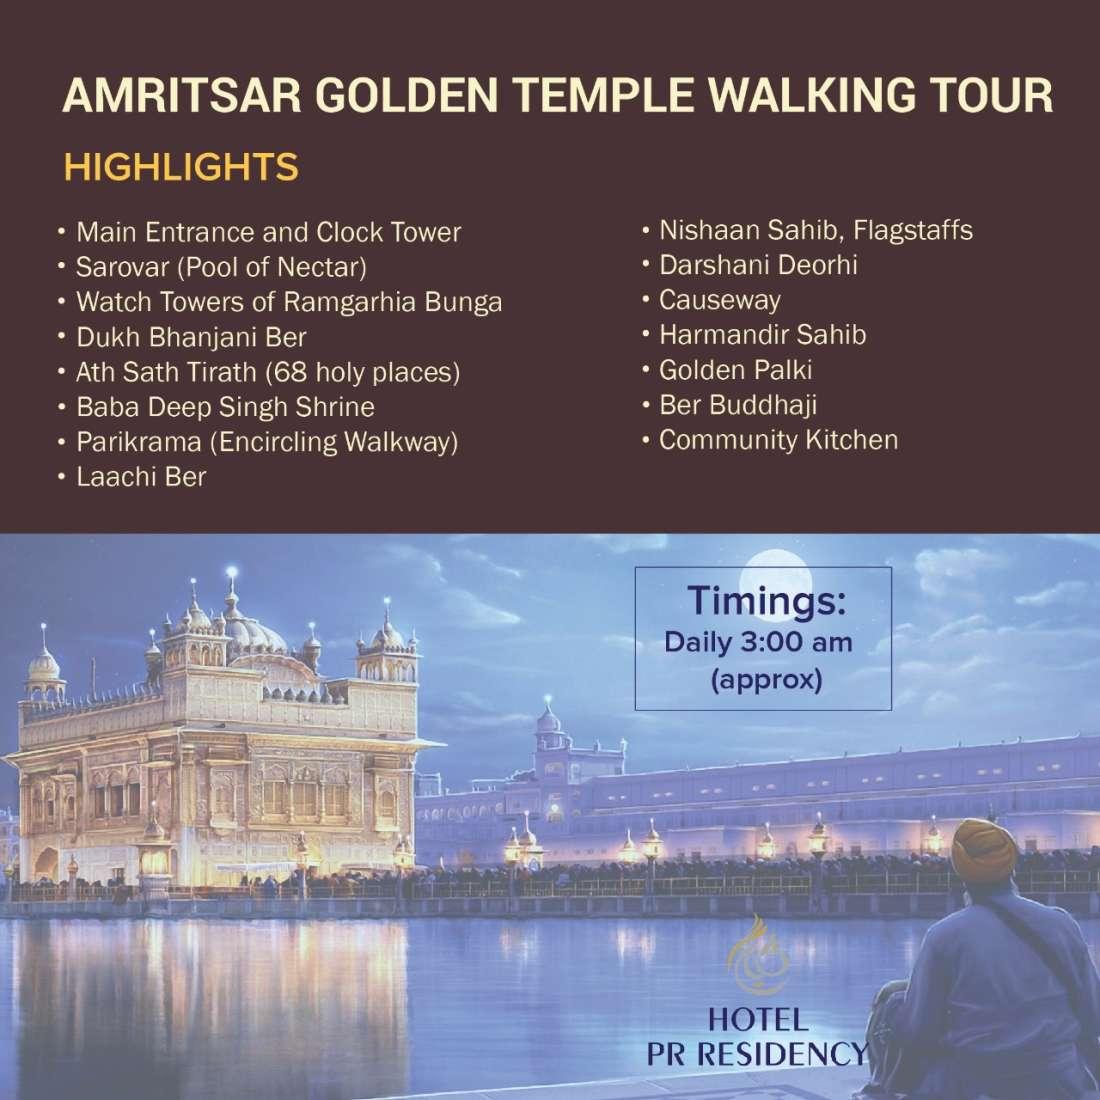 Golden Temple Walking Tour-Amritsar